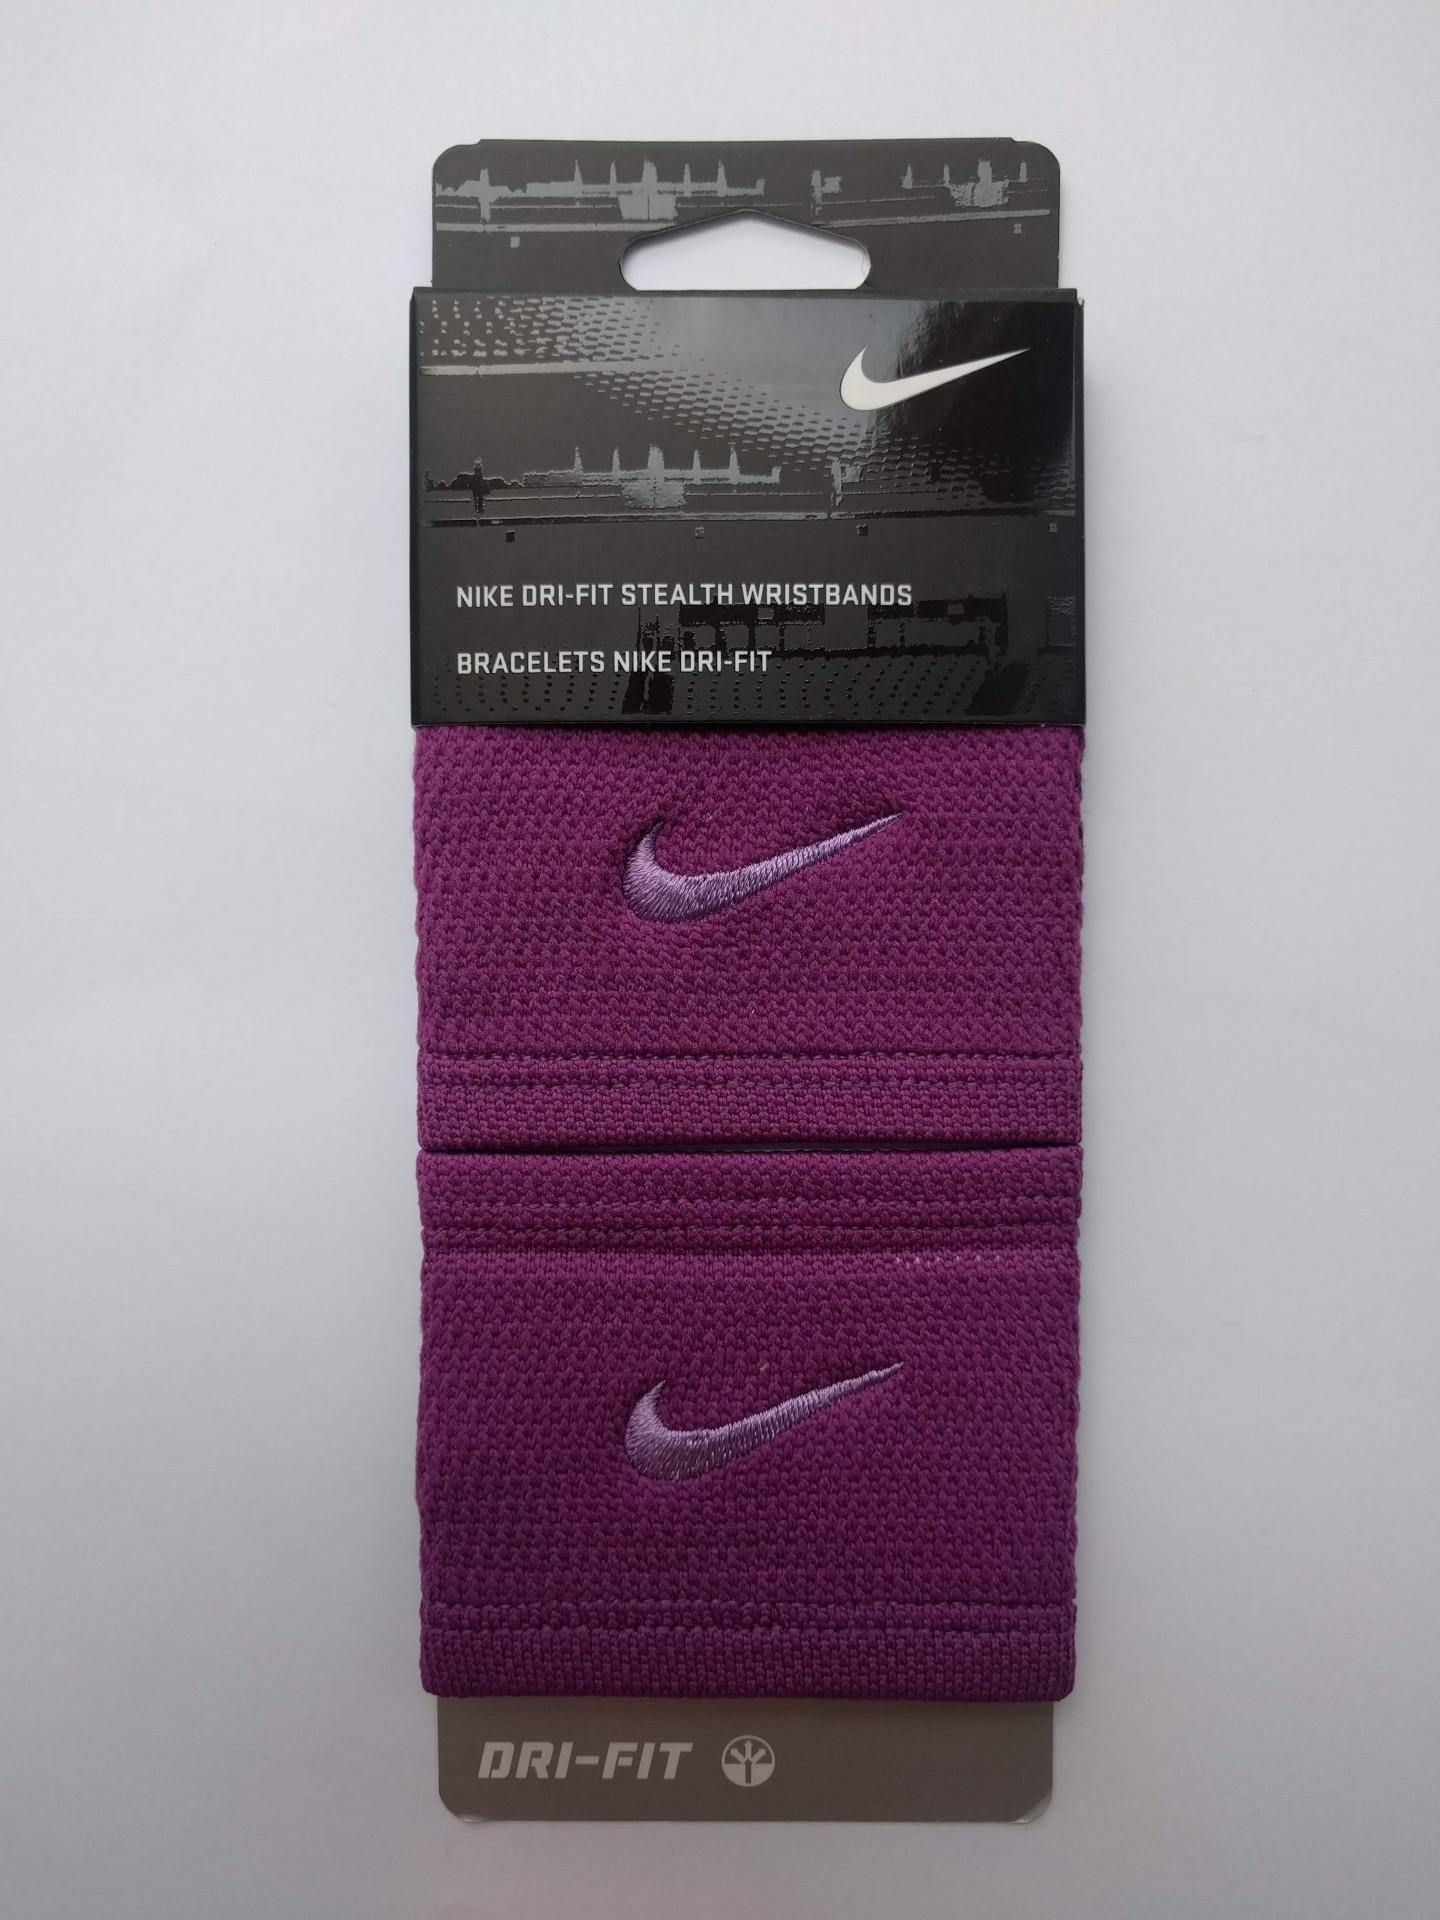 Potítko Nike Dri-Fit Stealth fialová ea039a2339